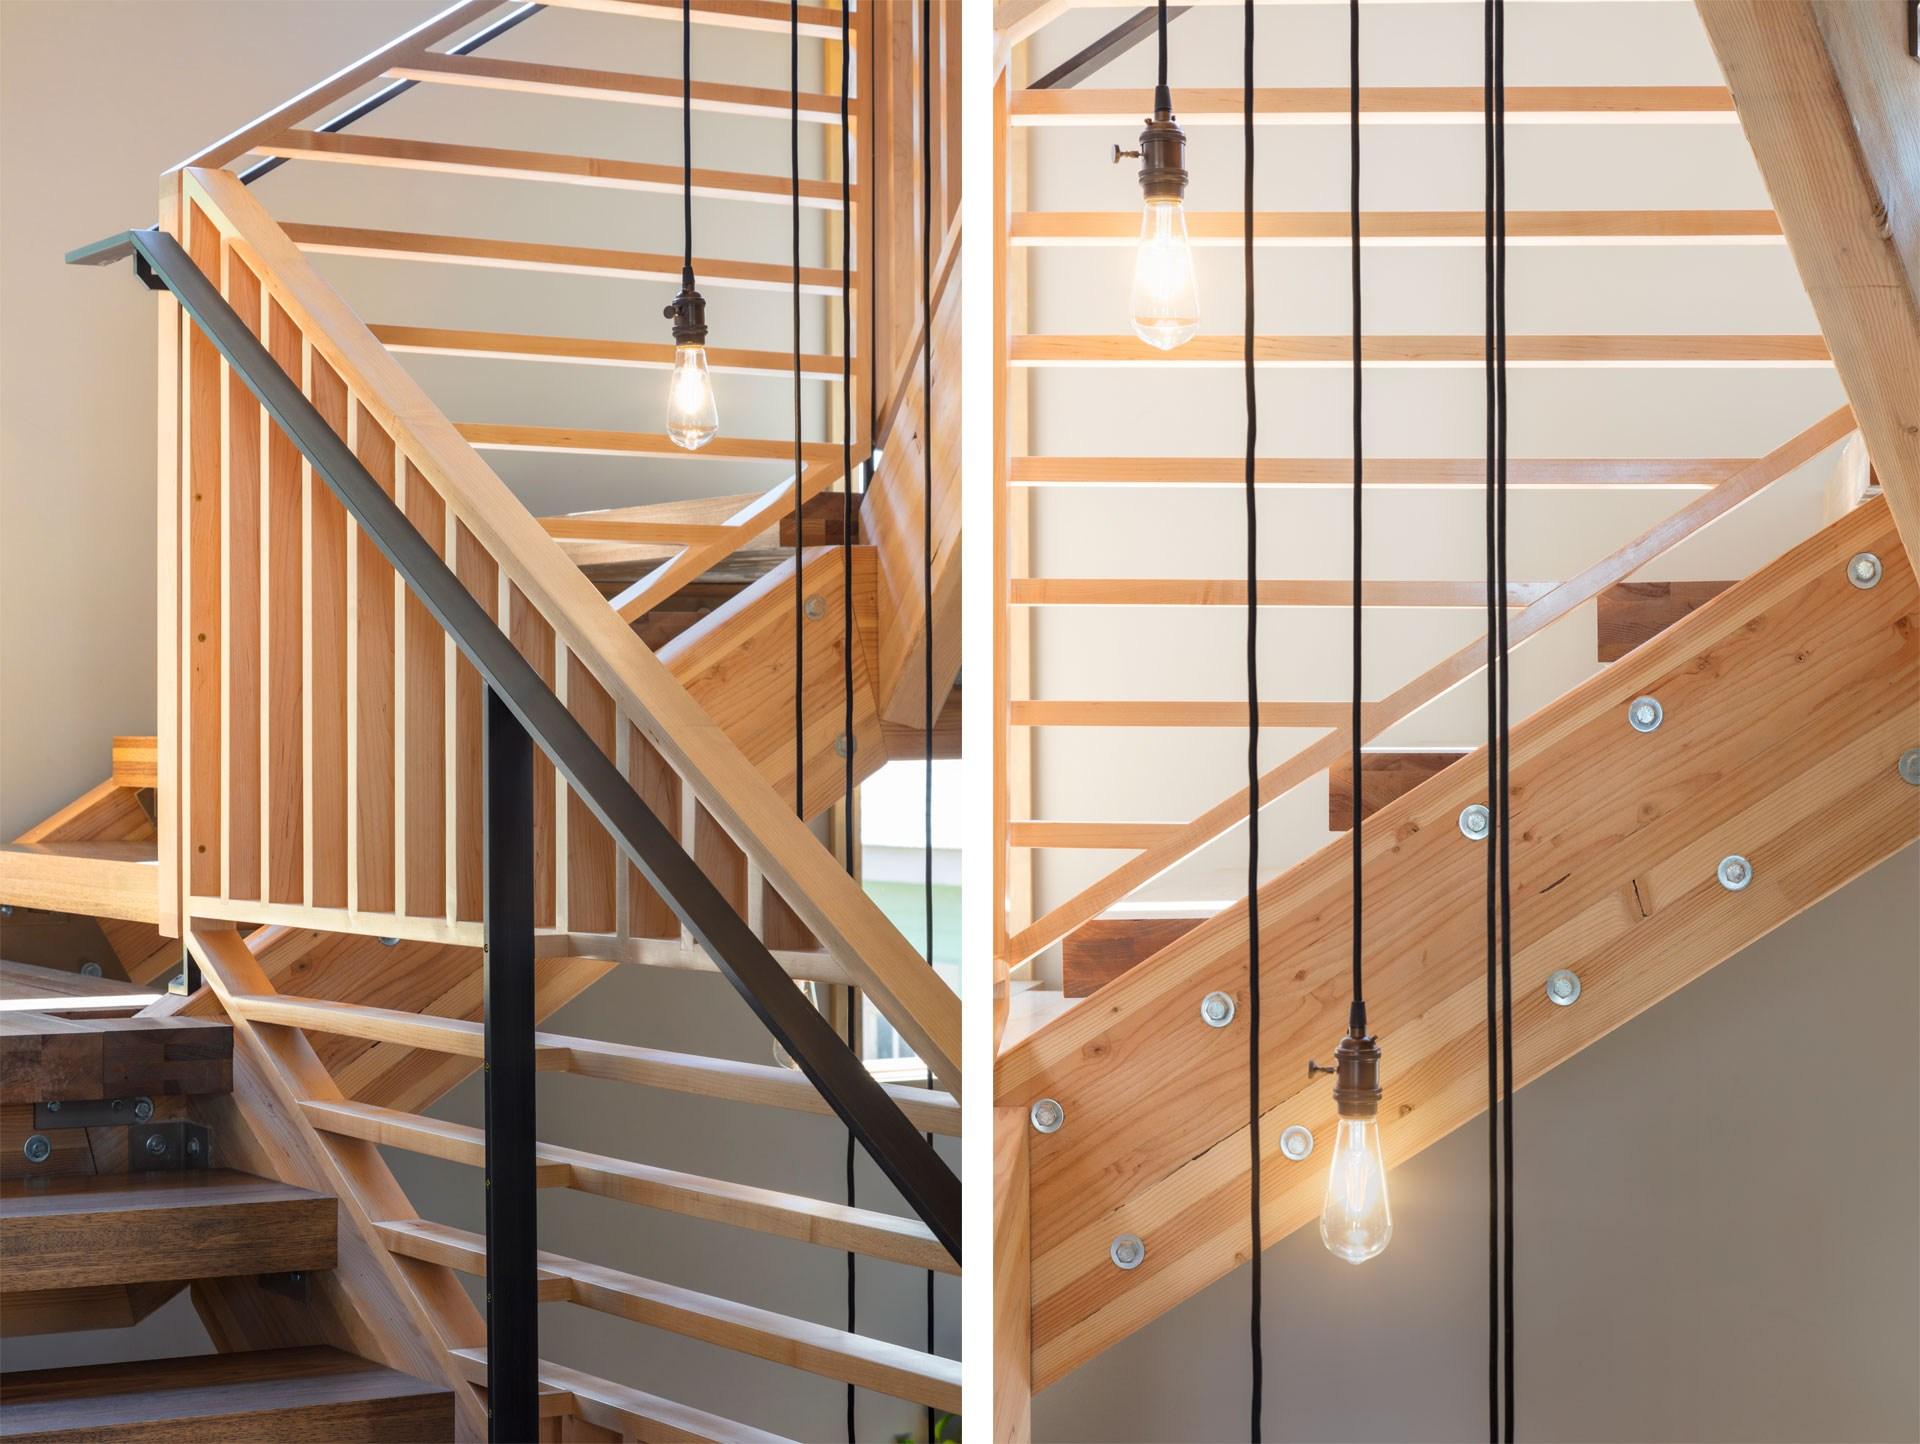 Quackenbush Modern Staircase Handrailing Joe Munson | Modern Stair Hand Railing | Stainless Steel | Decorative | Creative Outdoor Stair | Glass | Solid Wood